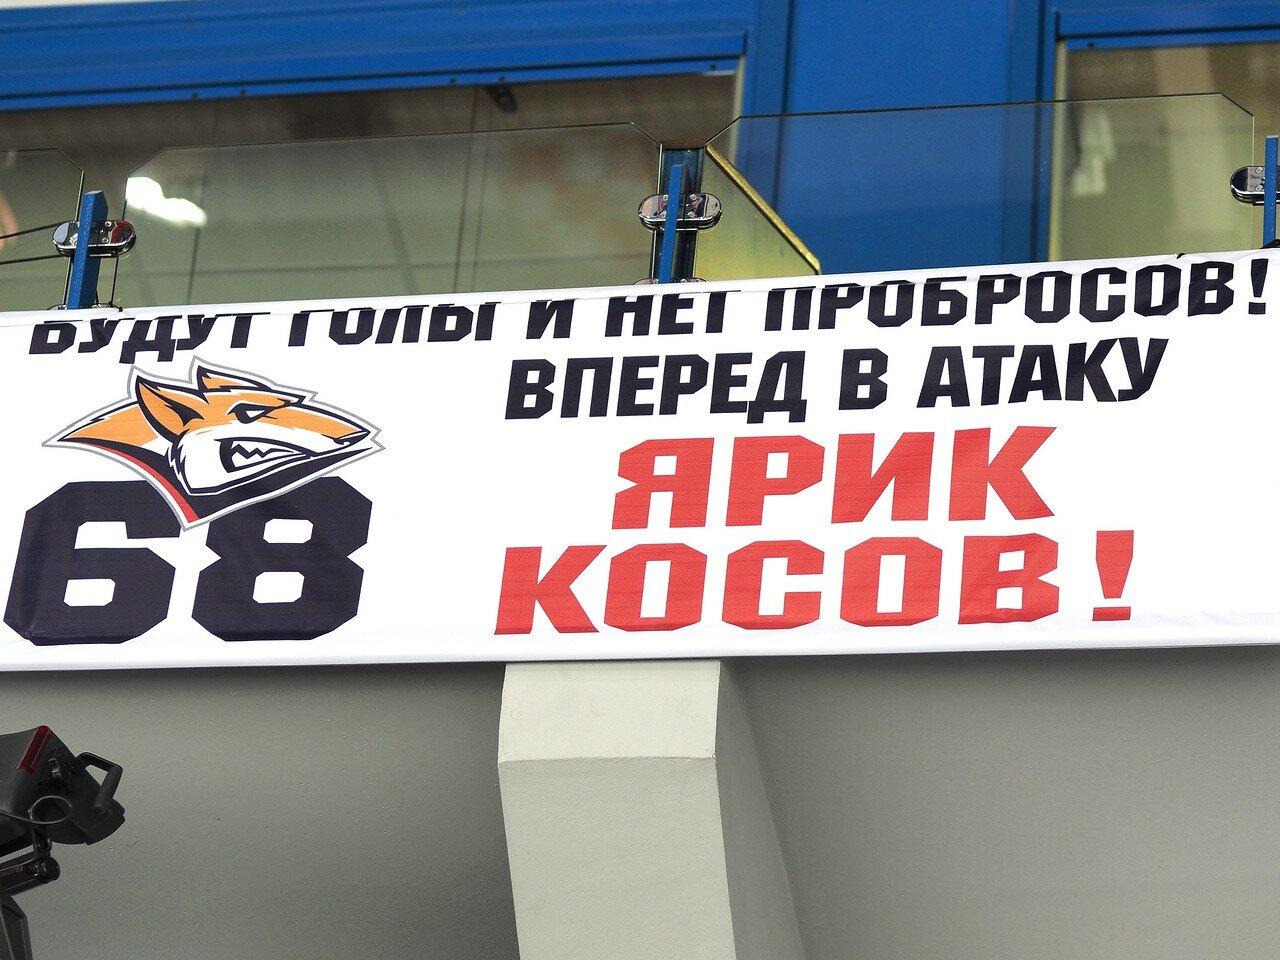 145Восток 1/2 плей-офф Металлург - Сибирь 08.03.2016